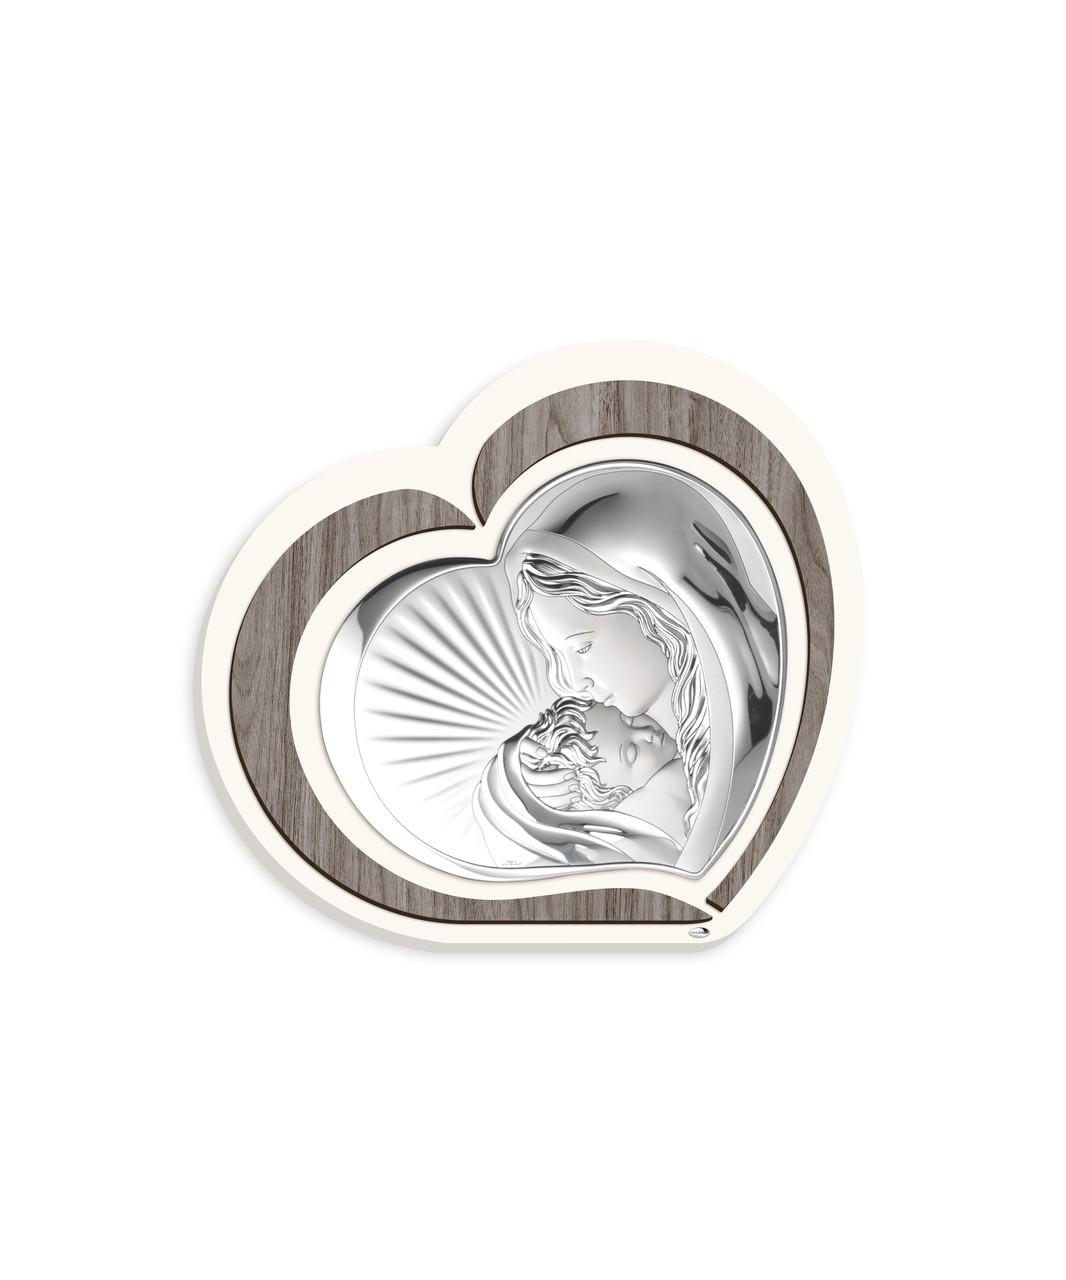 "Икона серебряная  ""Матерь Божия с Младенцем"" (10.5х9см) L221 1"